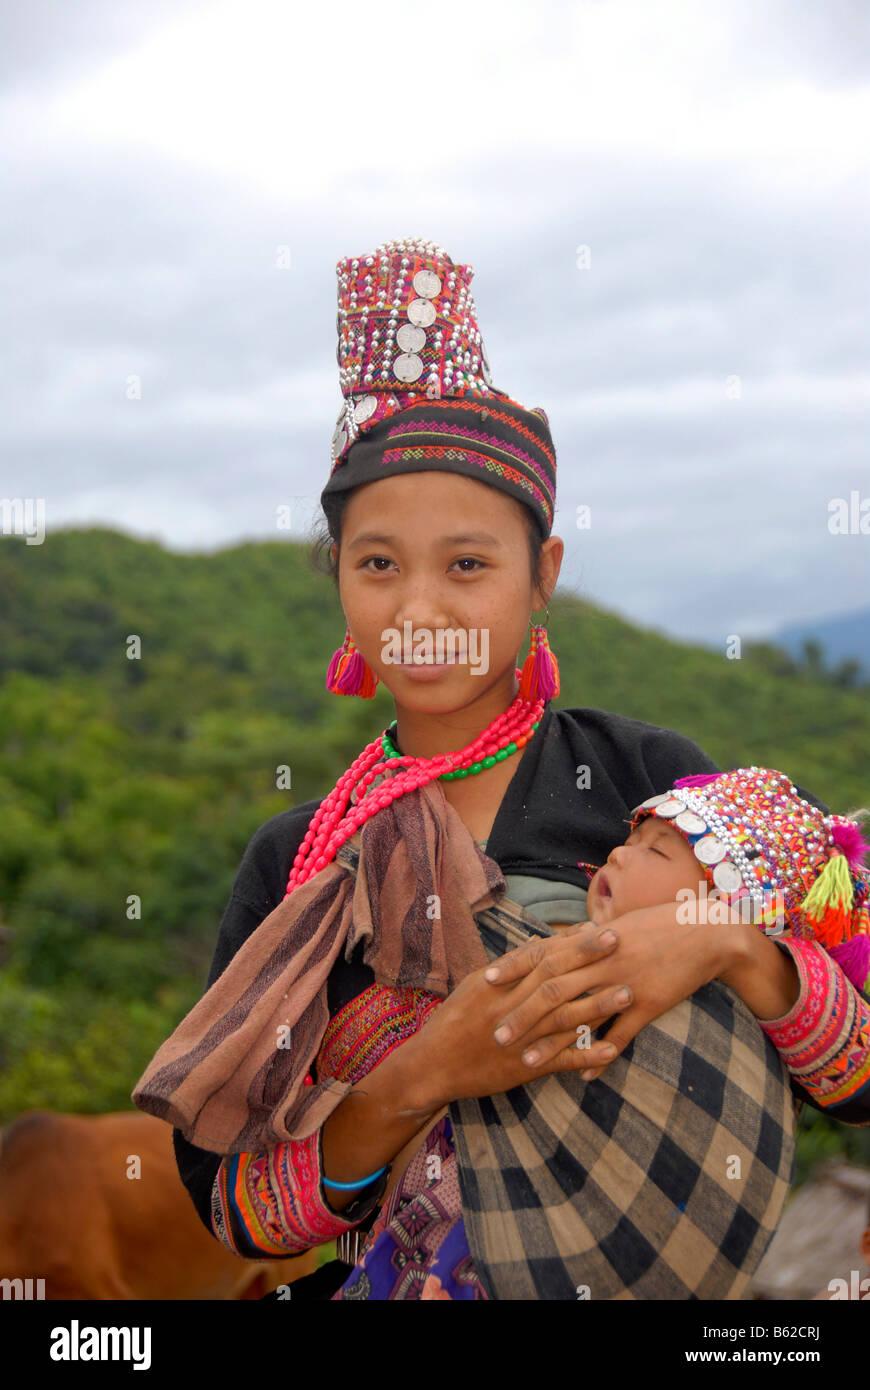 Junge Frau des Stammes Akha Pala in traditioneller Tracht mit ihrem Baby, Ban Pakha, Provinz Phongsali, Laos, Südostasien Stockbild